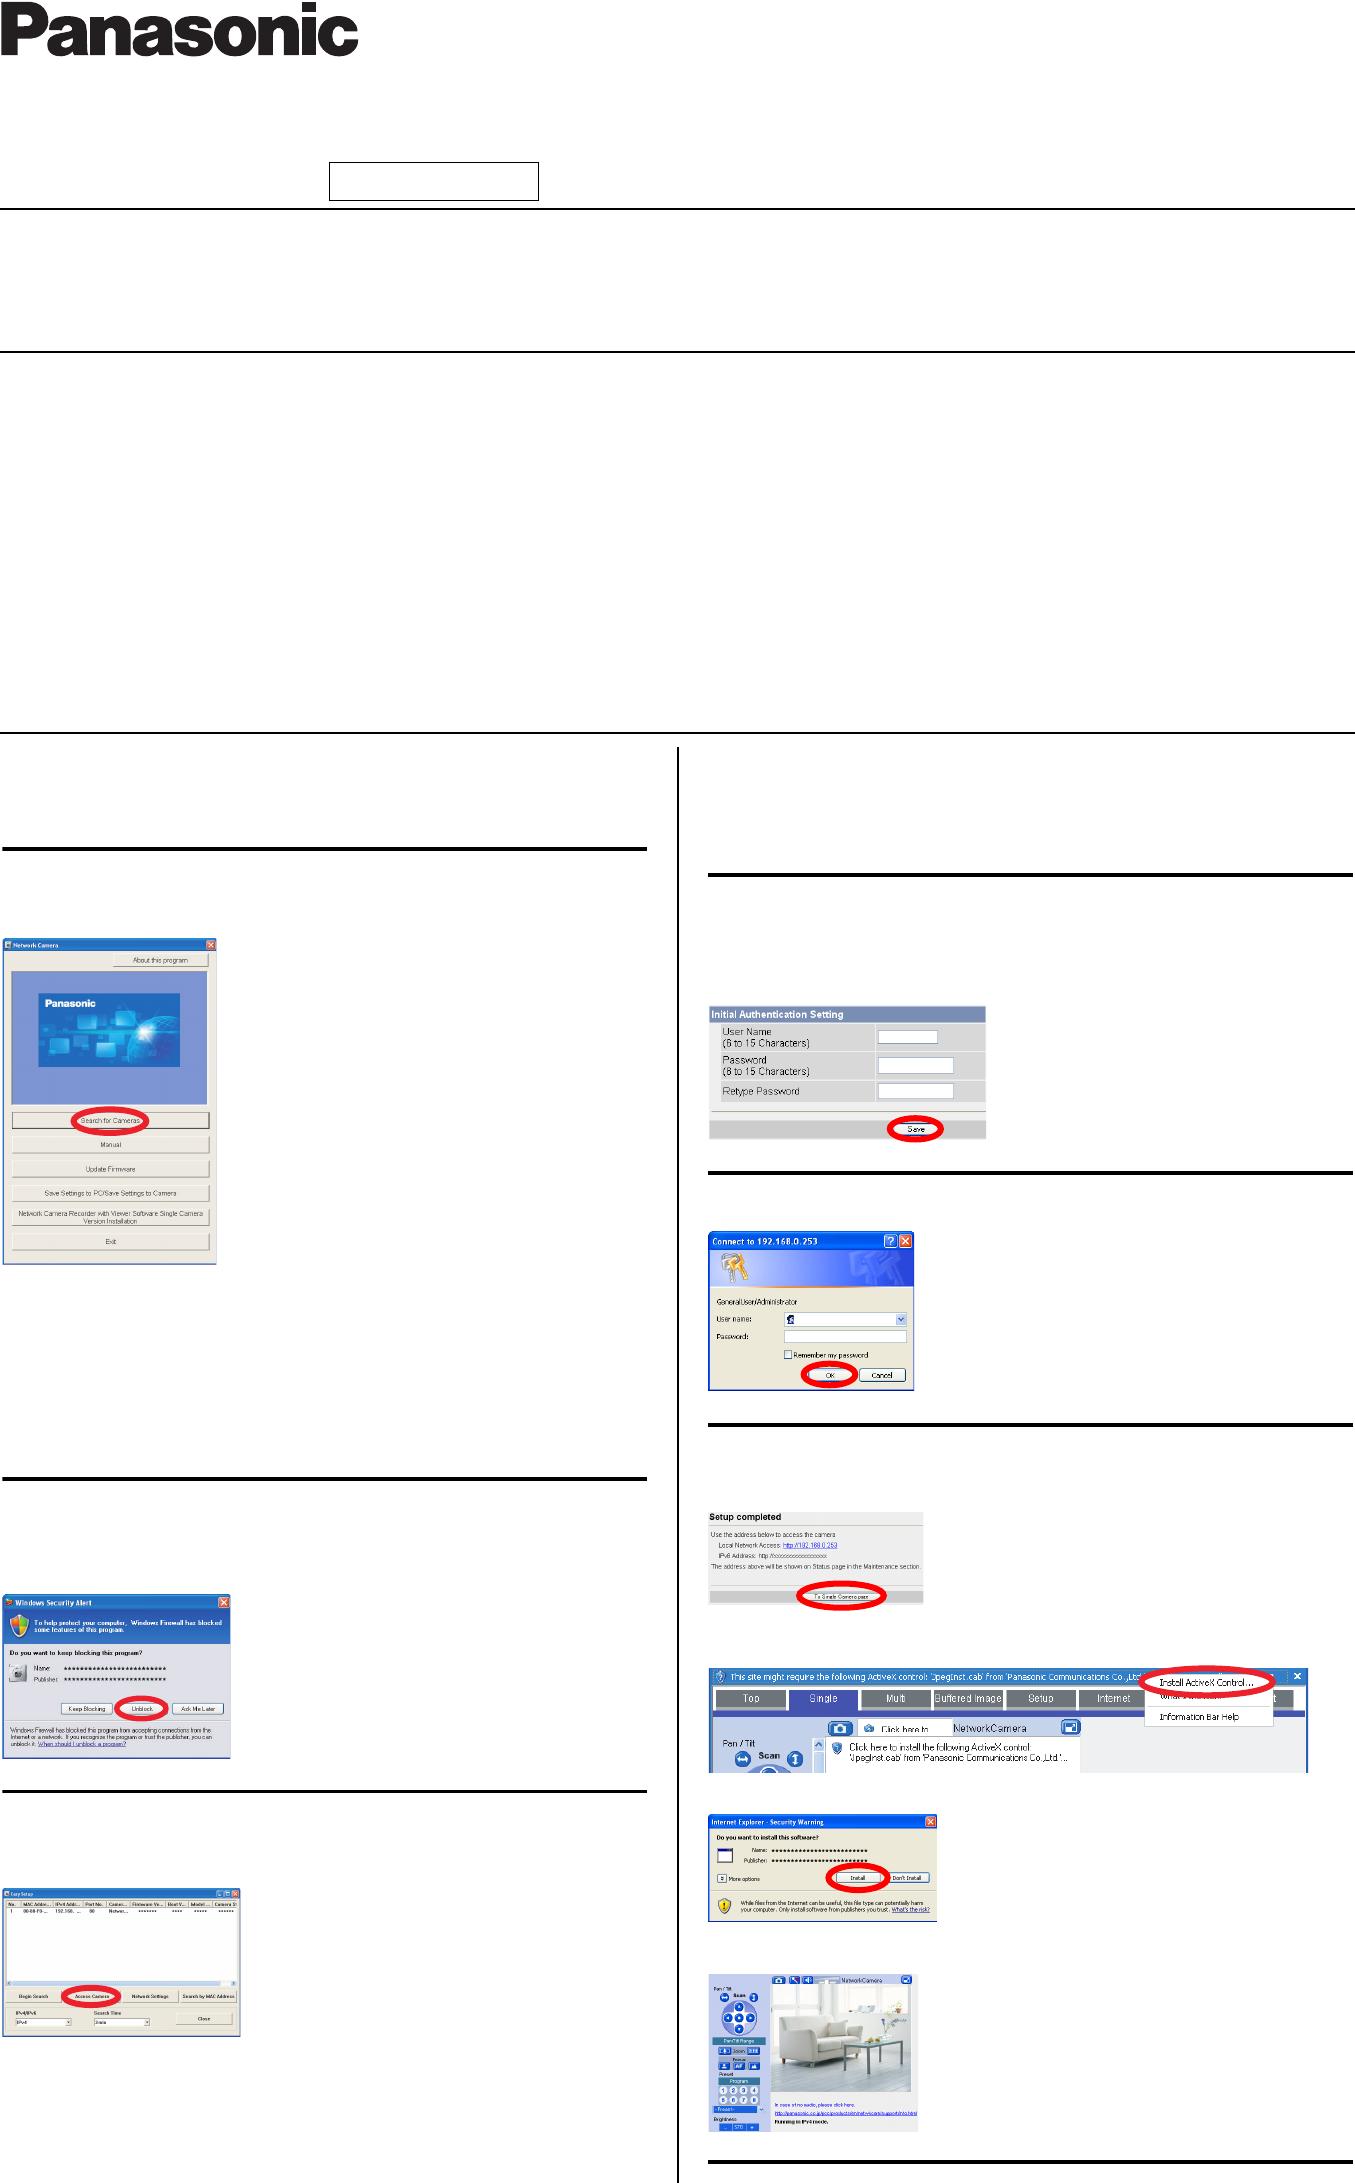 Handleiding Panasonic Bb Hcm580 Indoor Network Camera Pagina 1 Van Ptz Wiring Diagram